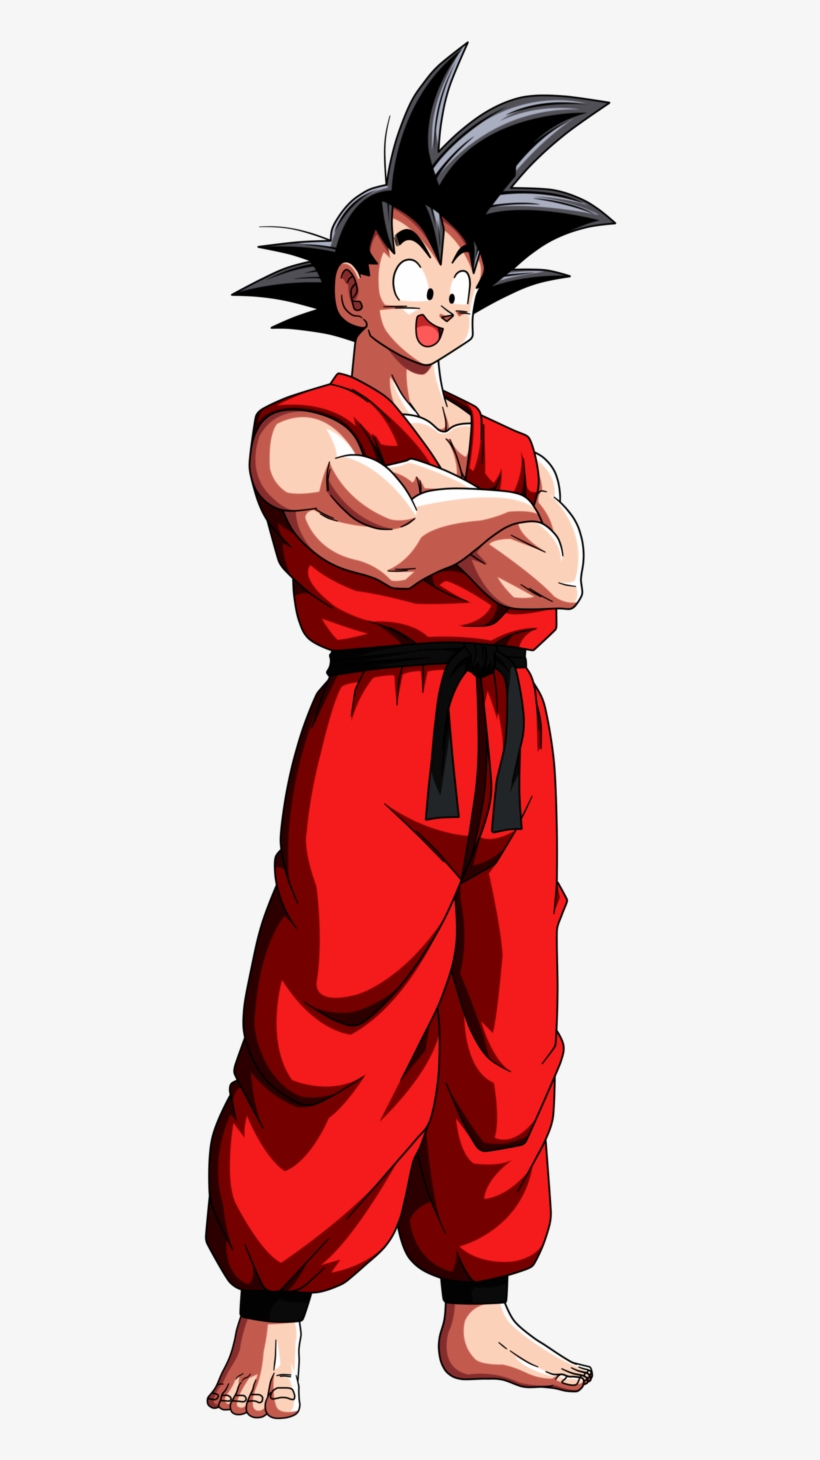 Goku Clipart Akira Toriyama Dragon Ball Goku Joven 575x1387 Png Download Pngkit